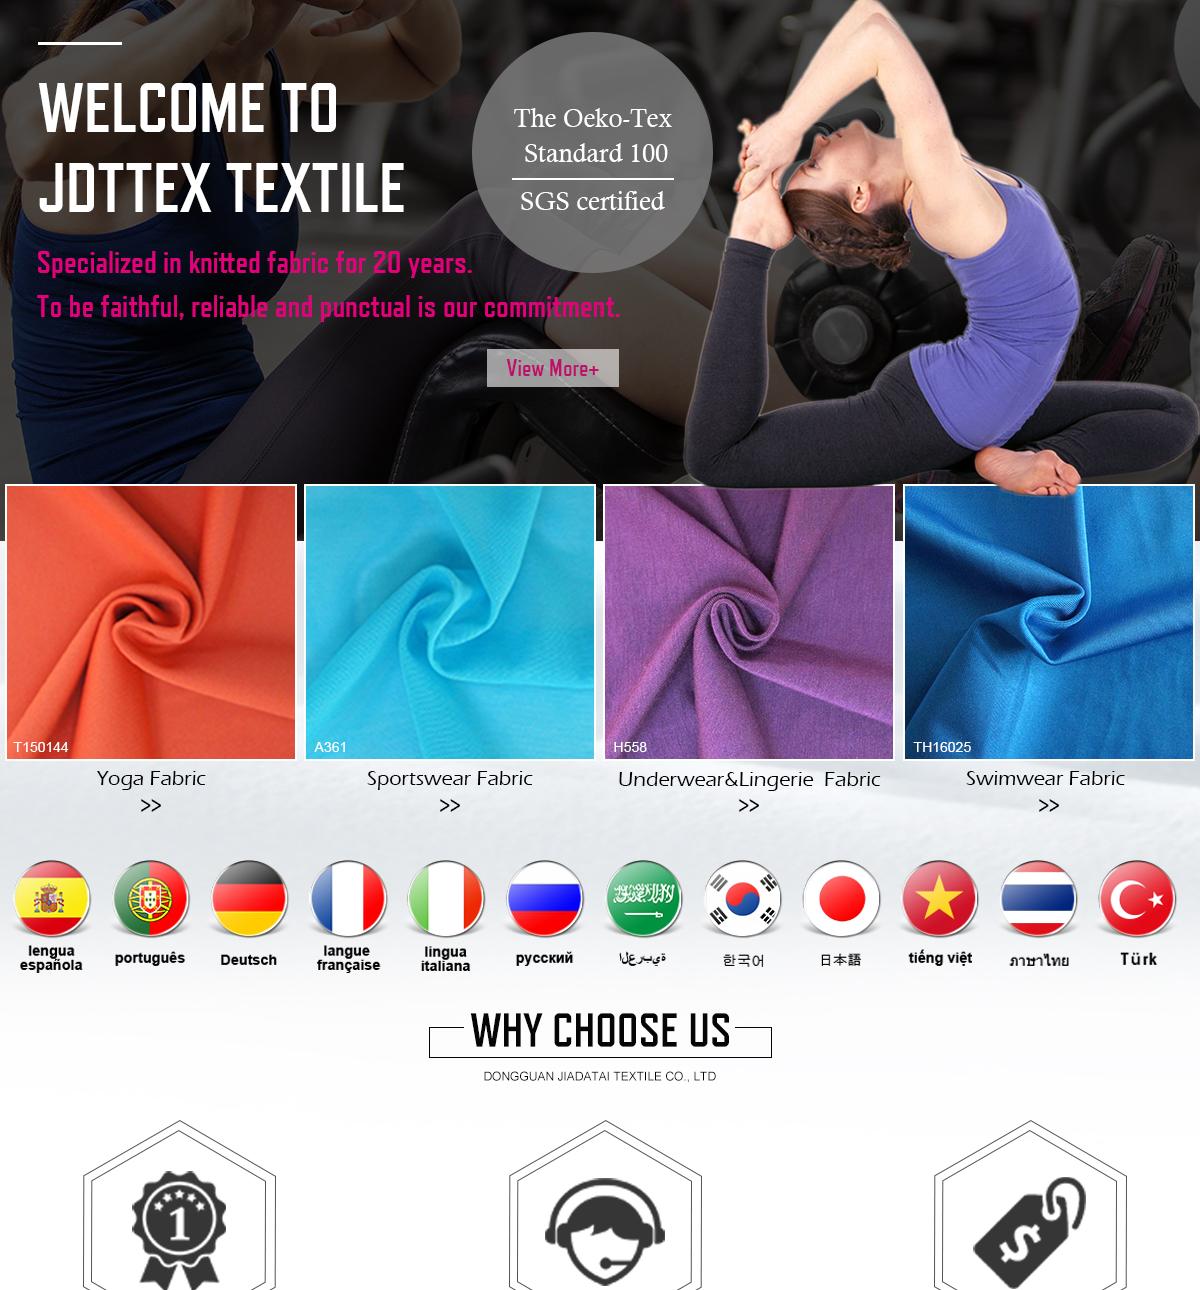 5f4ca81005 Dongguan Jiadatai Textile Co., Ltd. - Swimwear Fabric, Sportswear Fabric